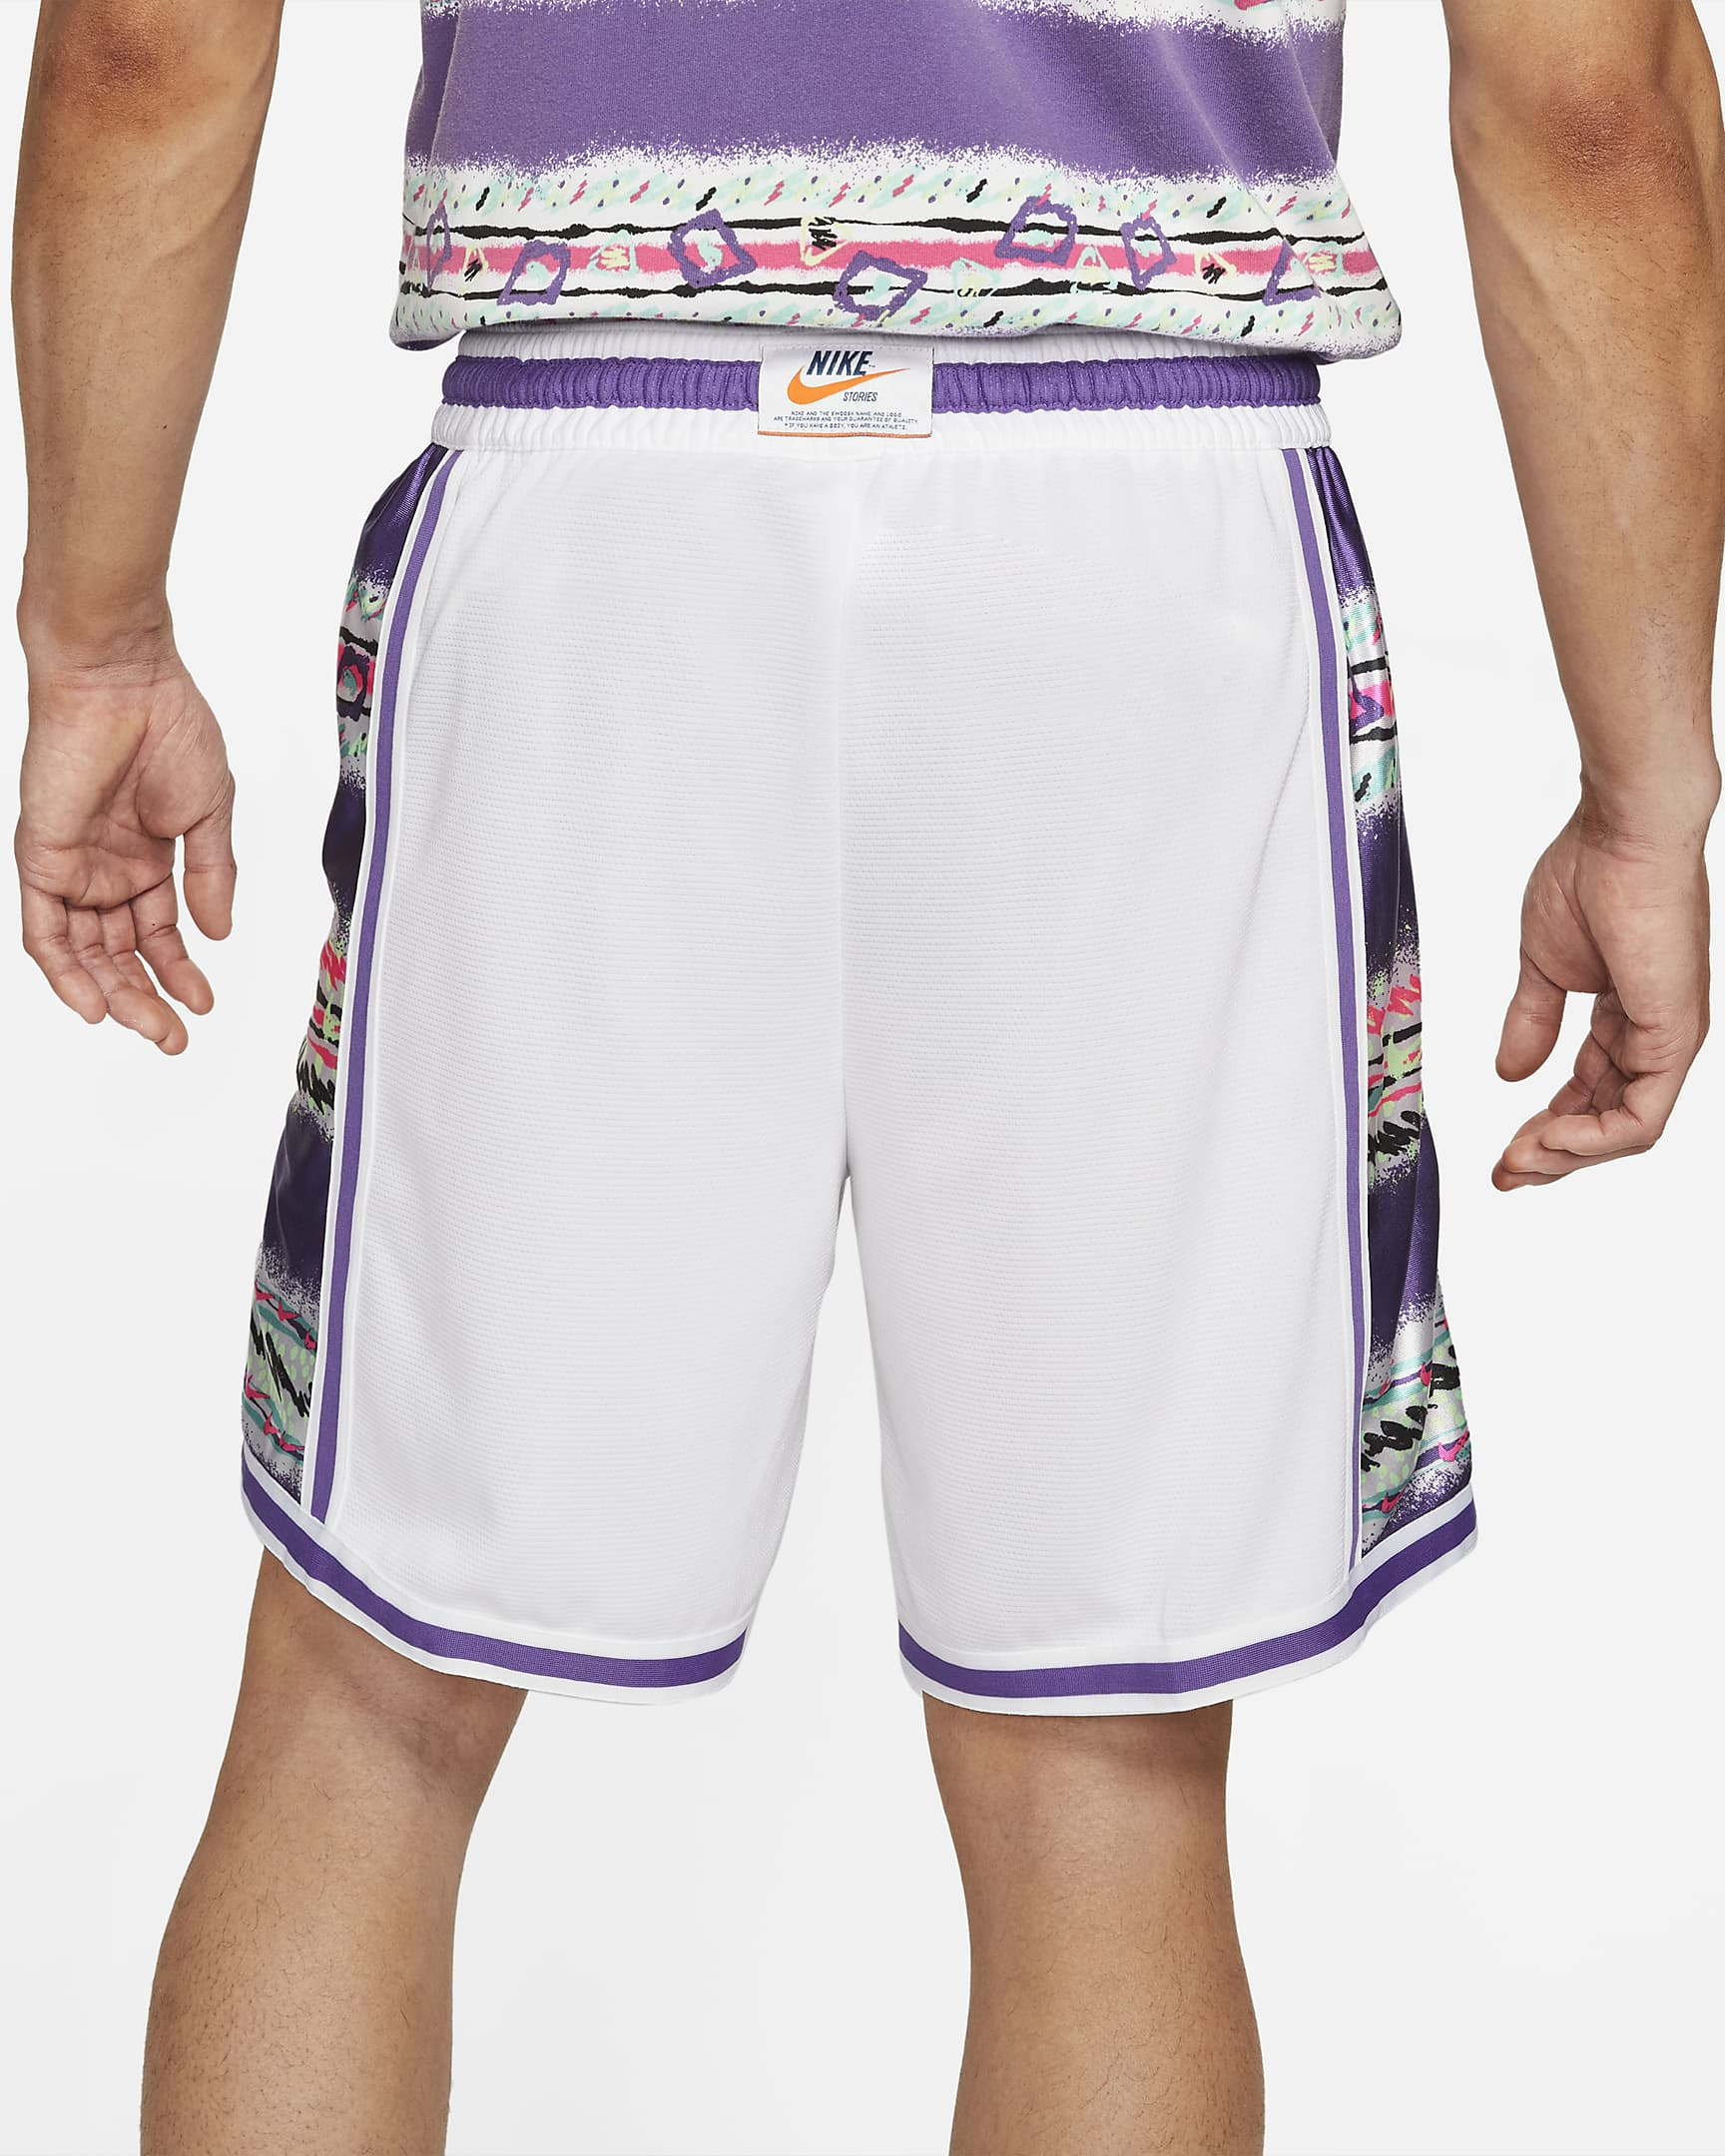 nike-dri-fit-dna-stories-mens-basketball-shorts-gLqWHW-7.png